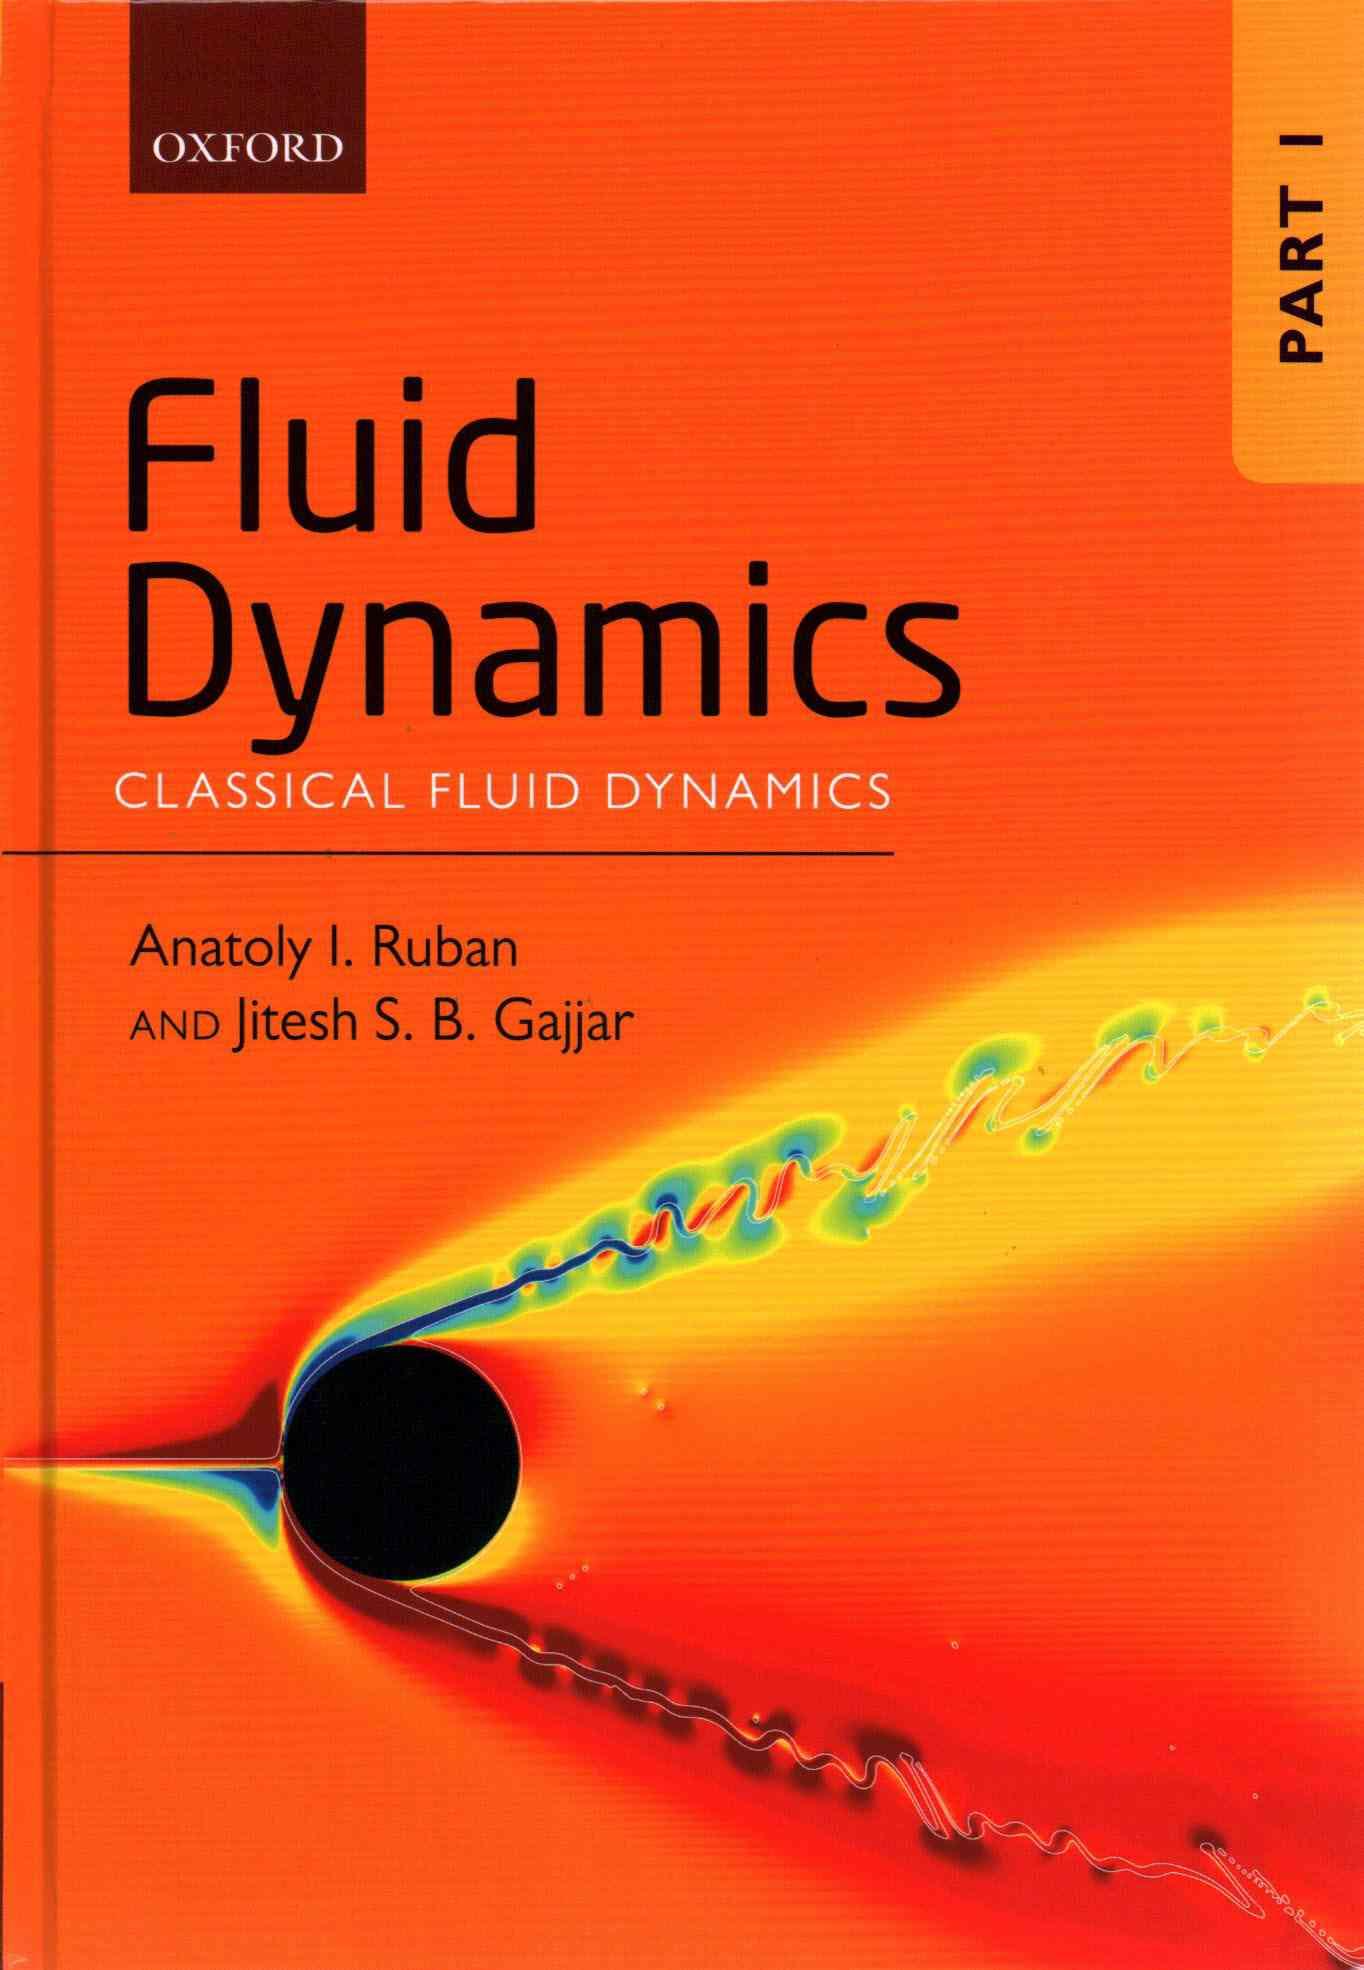 Fluid Dynamics By Ruban, Anatoly I./ Gajjar, Jitesh S. B.